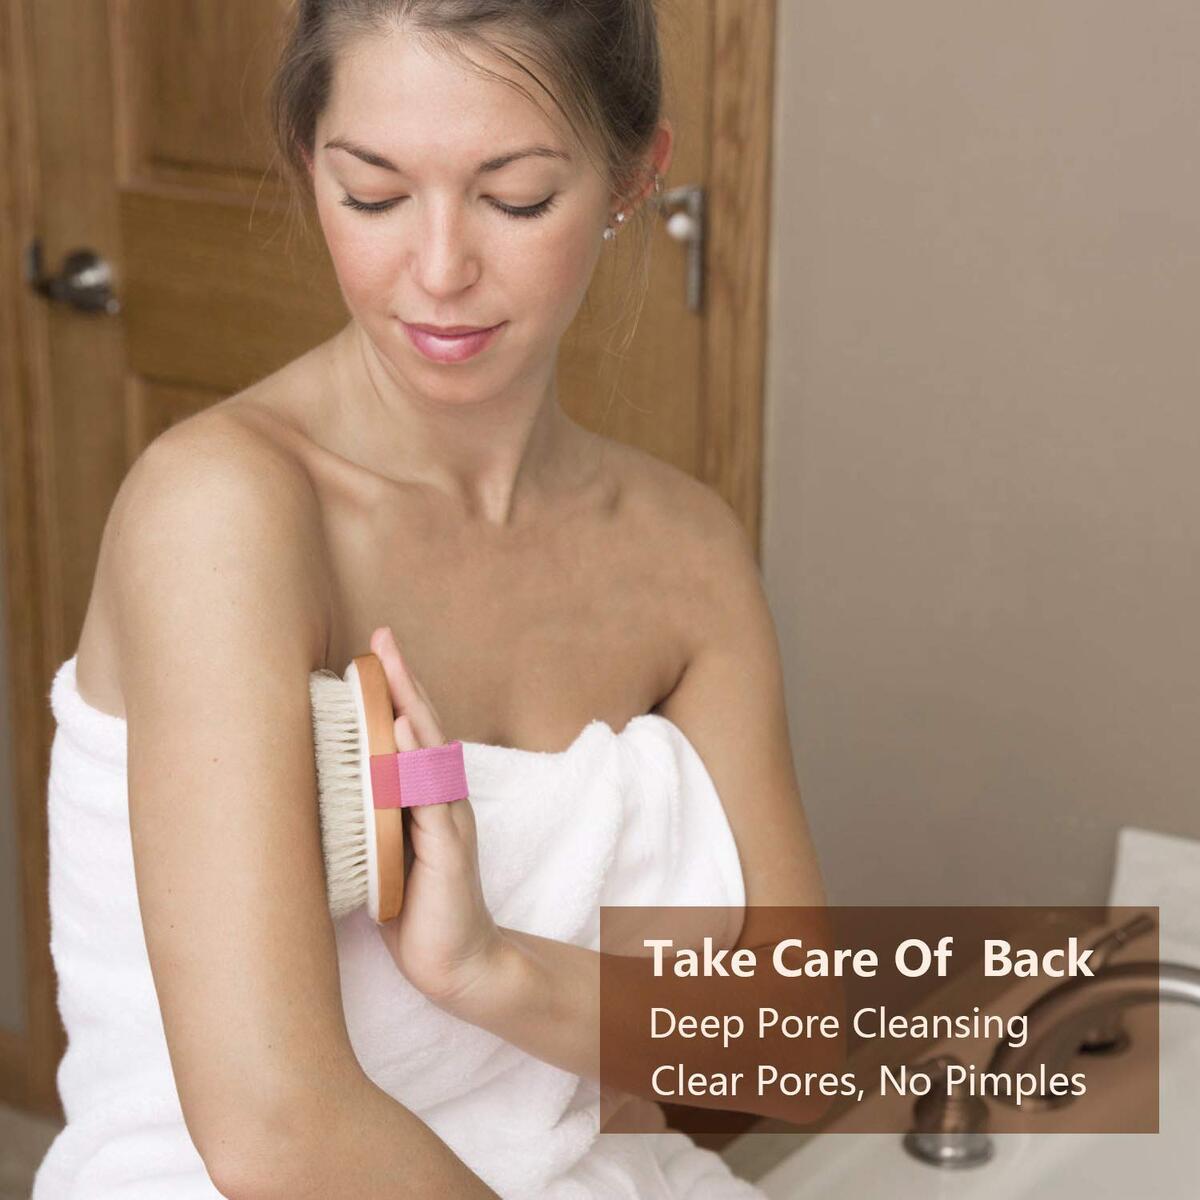 Dry Bath Body Brush Round Wet and Dry Skin Exfoliating Shower Brush, Deep Massage, Soften Stratum Corneum and Remove Aging Skin, Wake up Body Functions